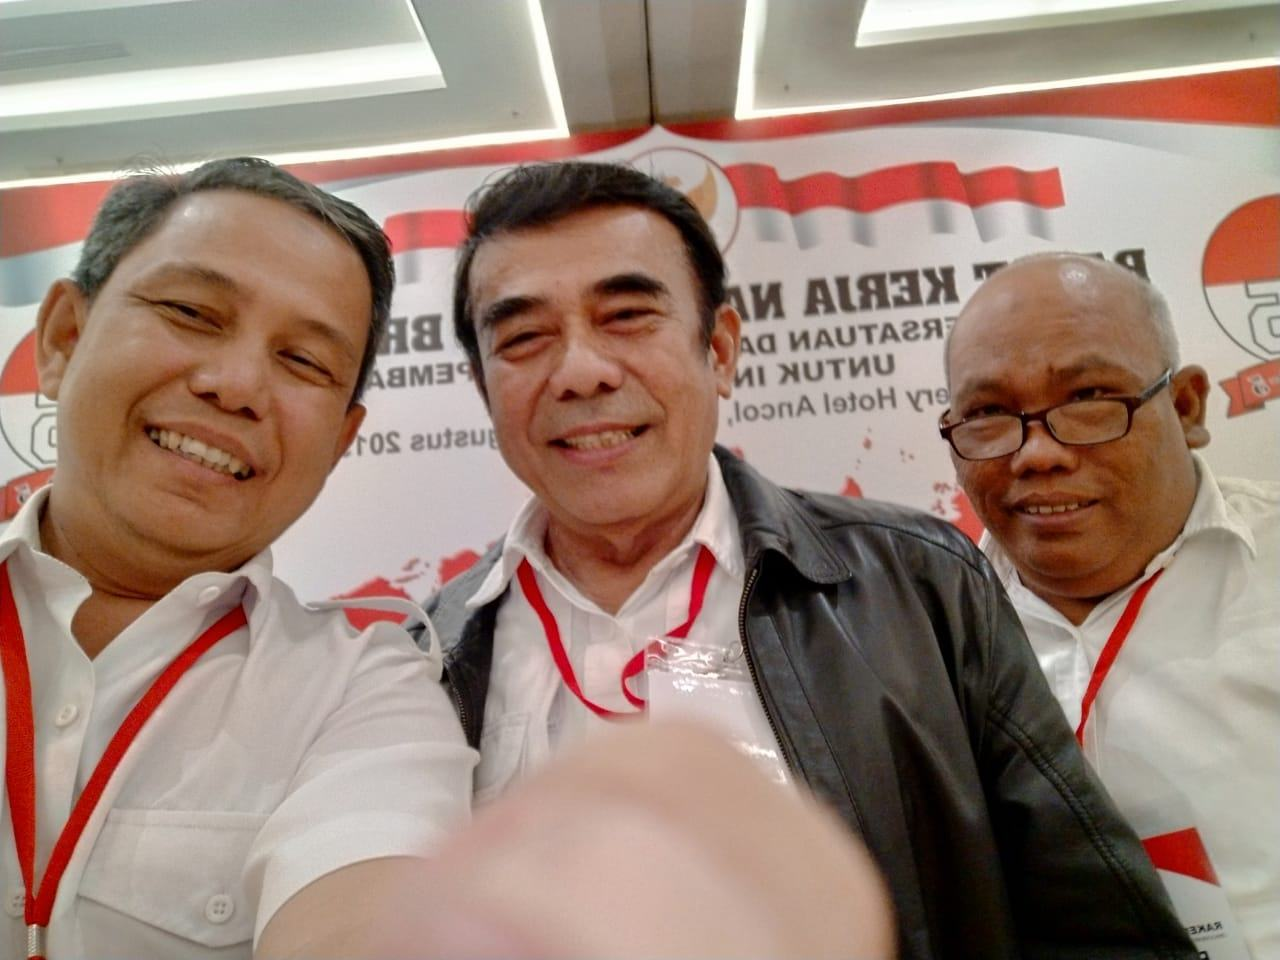 Menteri Jokowi, Bravo 5 Sumut : Jenderal Purn Fachrul Razi Pantas Diusung